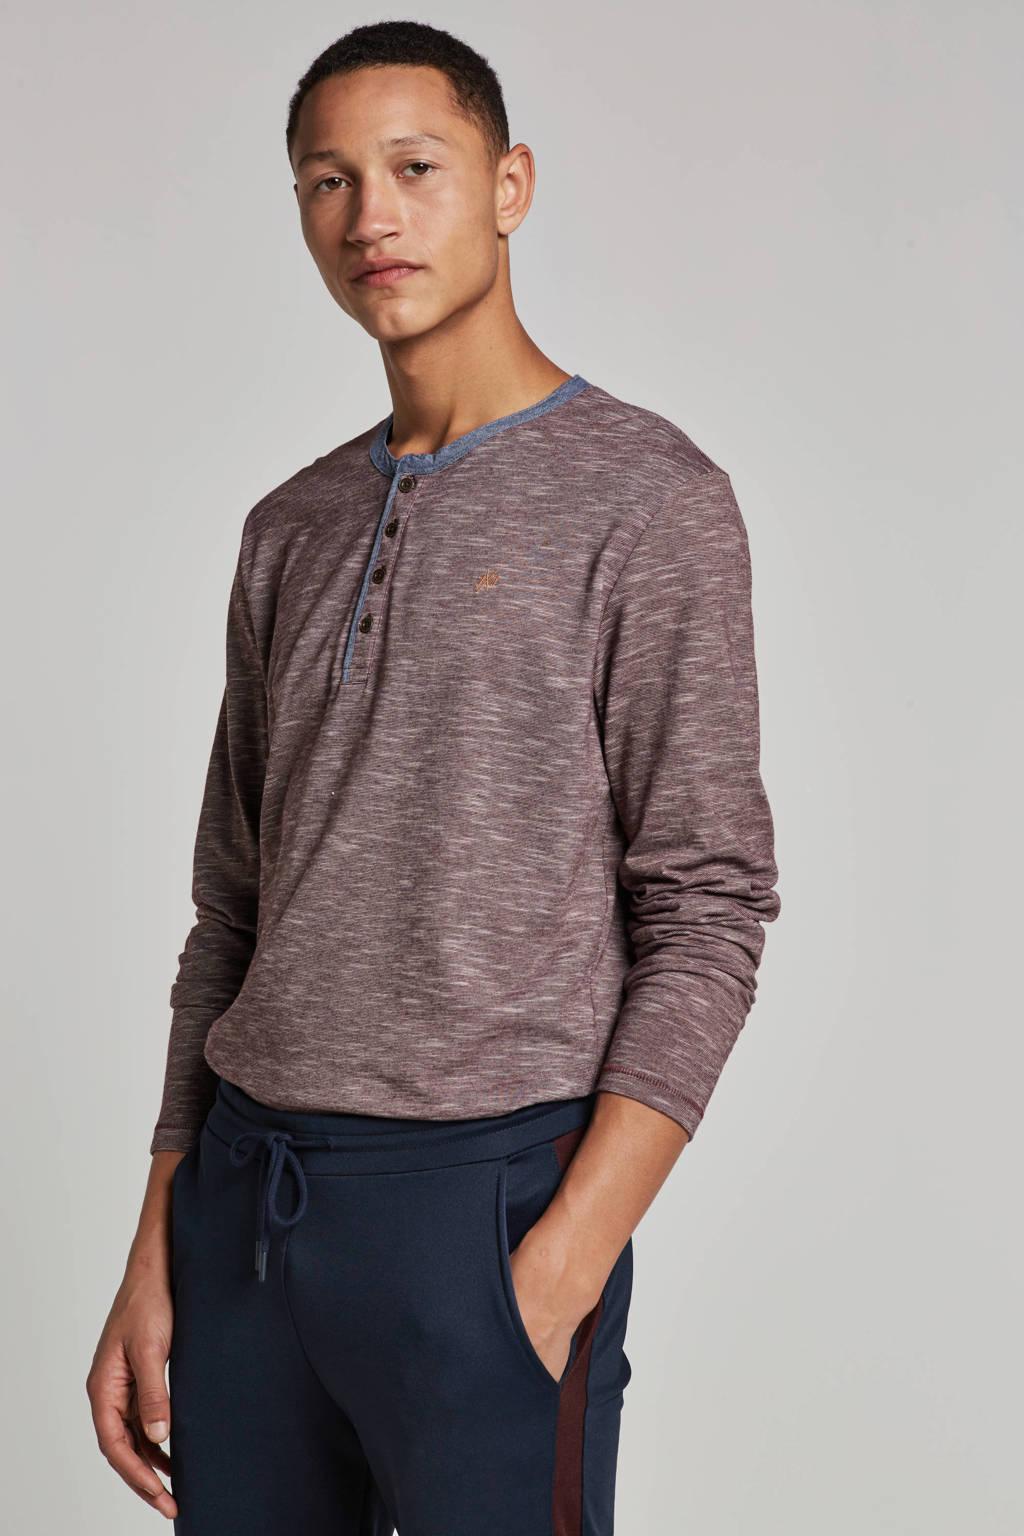 Jack & Jones Originals t-shirt longsleeves, Rood/blauw